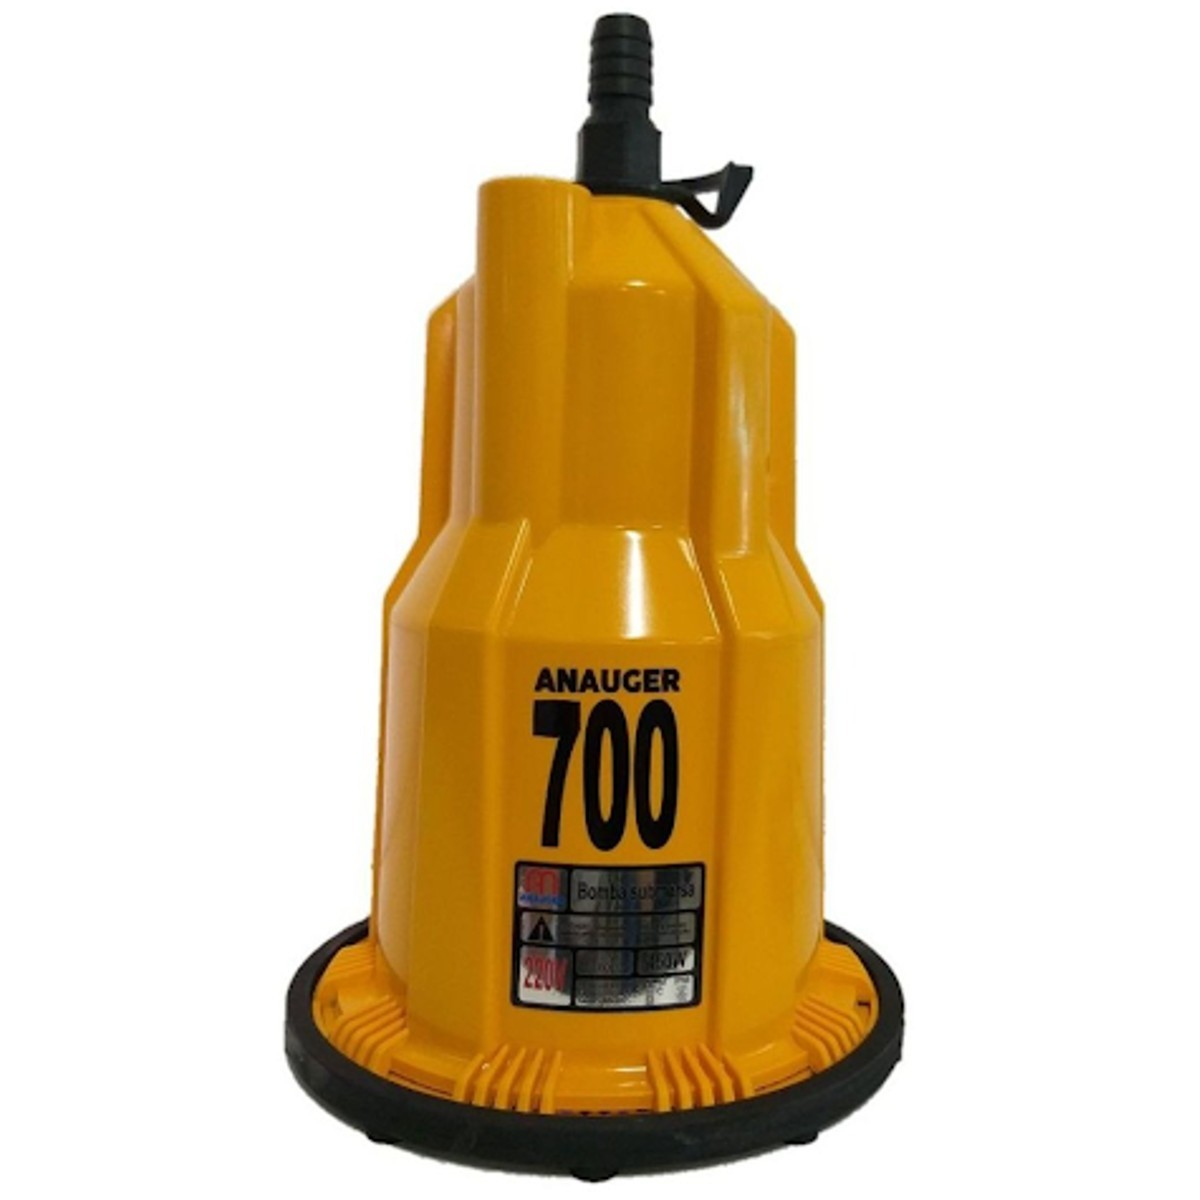 Bomba Vibratória  ANAUGER 700 5G 450 Watts  110V Monofásica